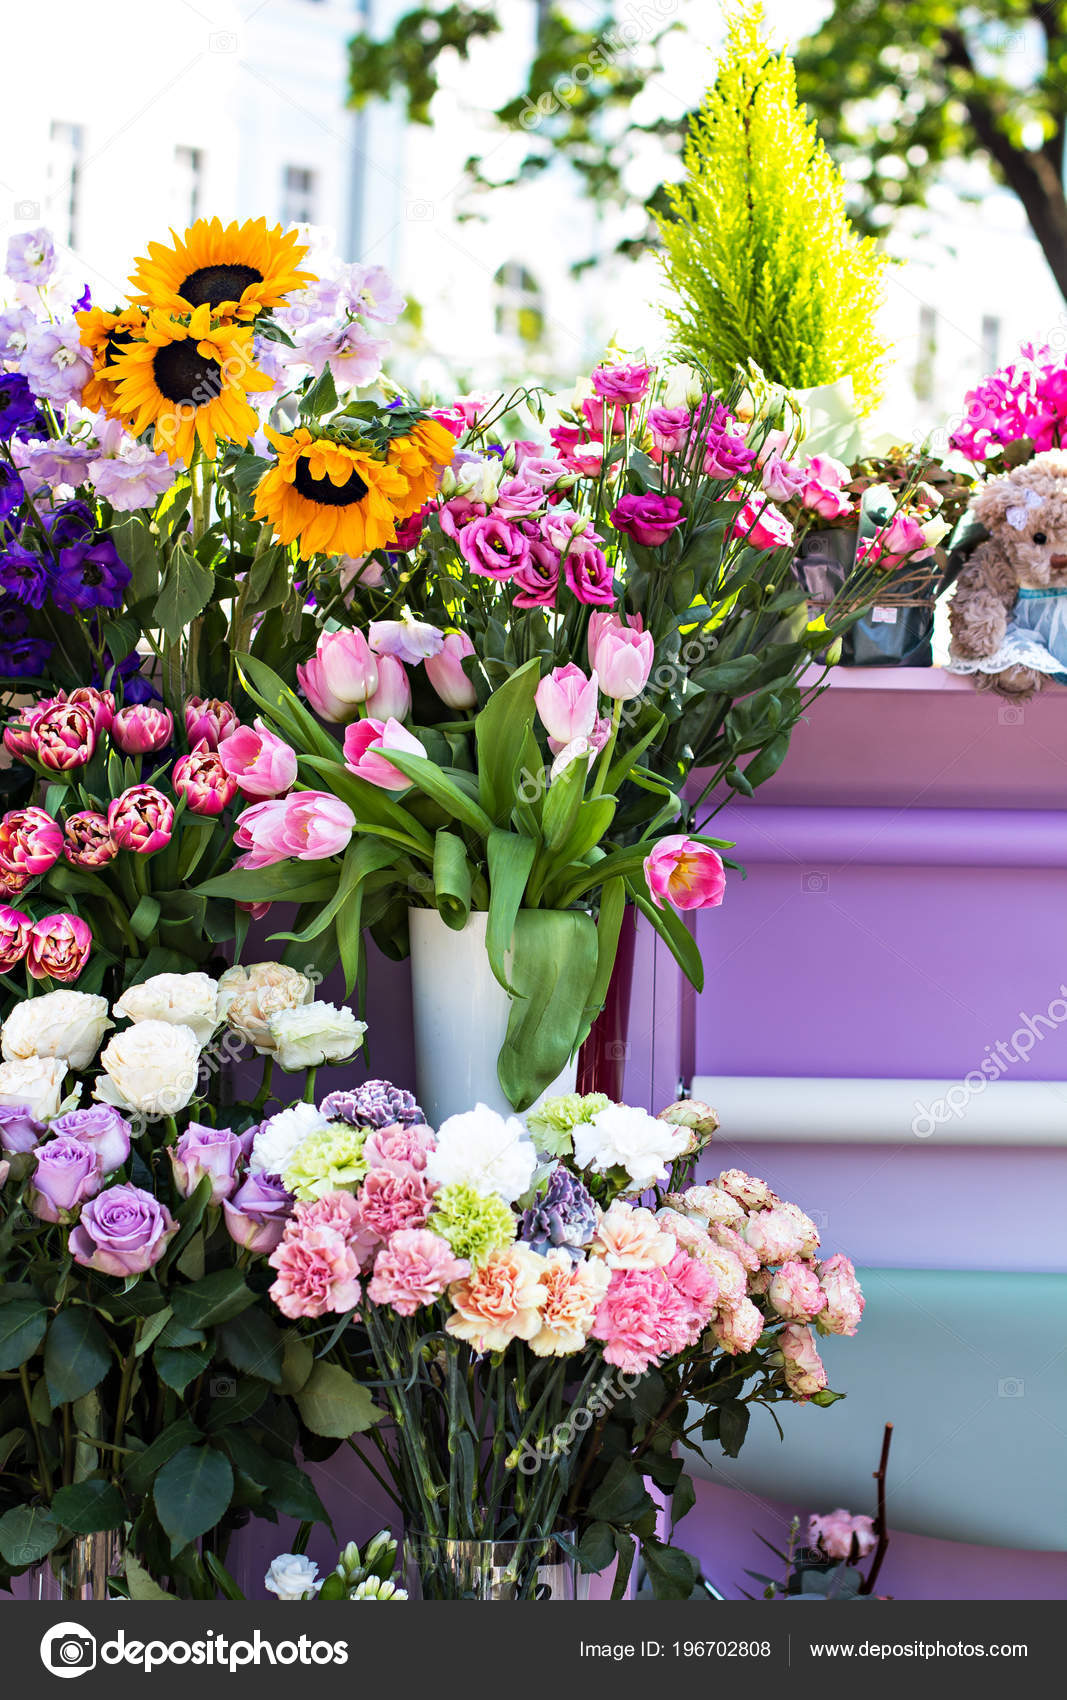 Pictures : beautiful flowers bouquets | Beautiful Bouquets Flowers Market  Showcase Flowers Sale Flowers Flower Shop — Stock Photo © JuliaLototskaya  #196702808